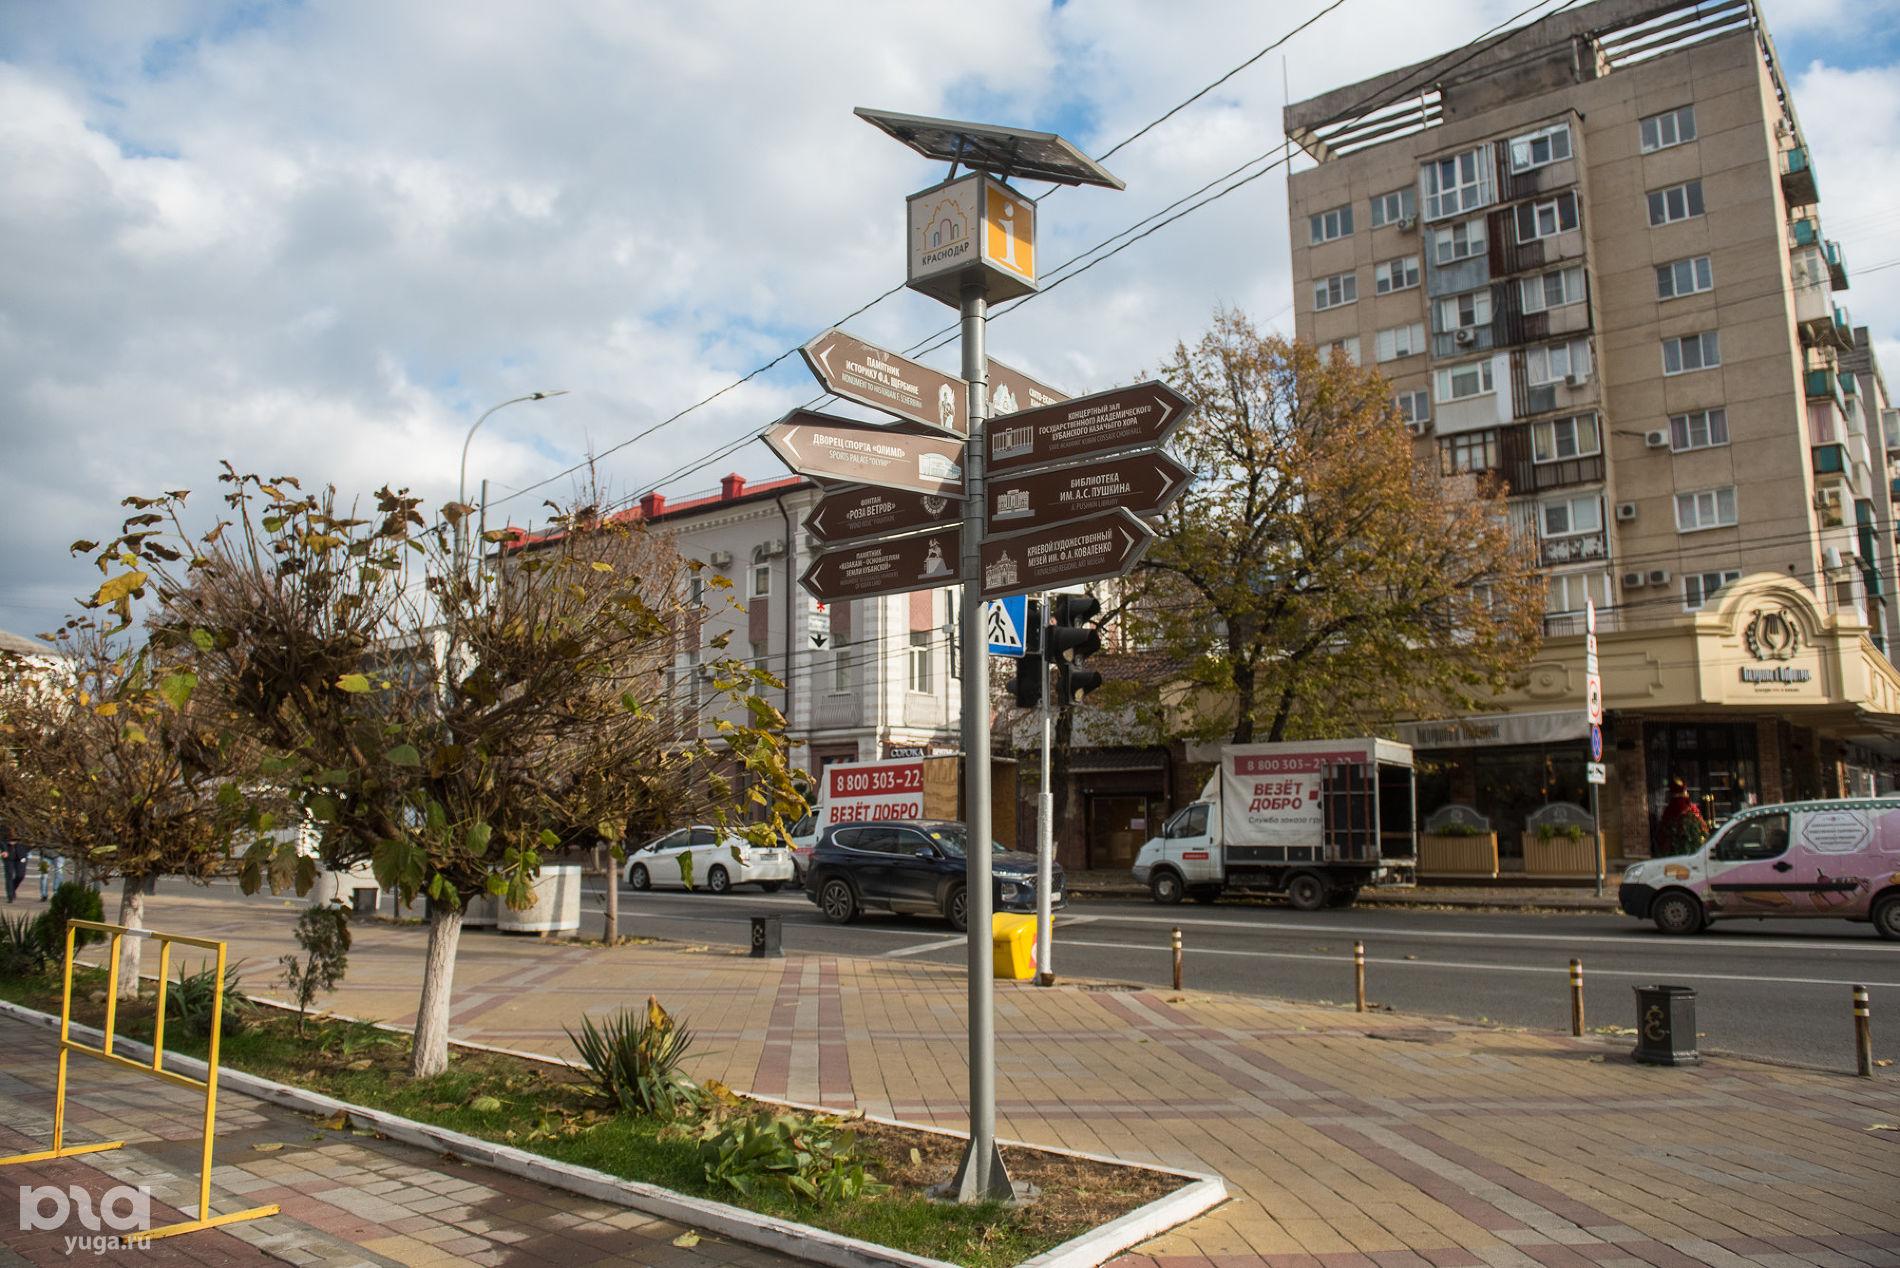 Краснодар, 2020 год ©Фото Елены Синеок, Юга.ру